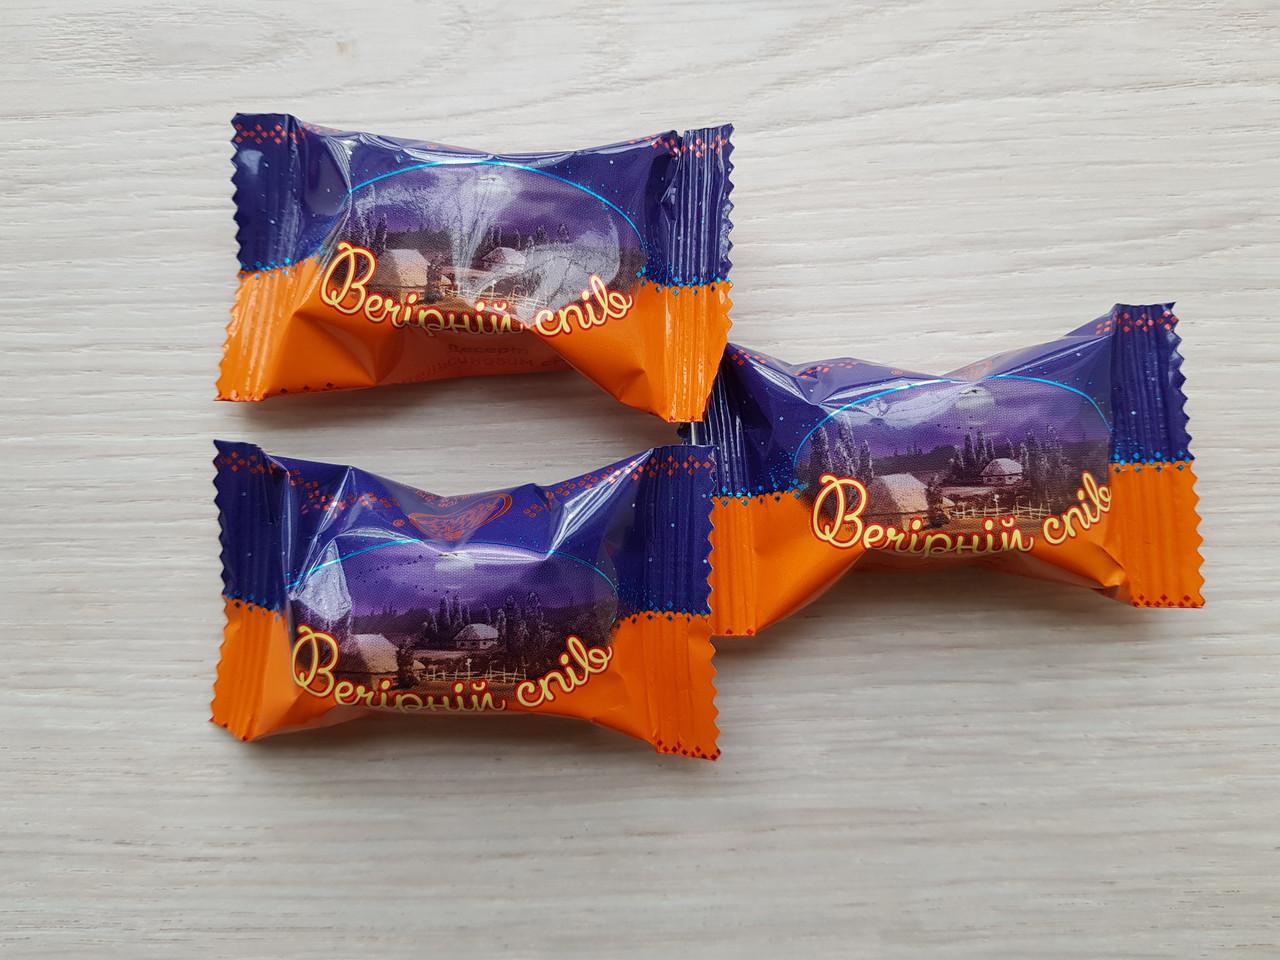 Конфеты оптом Вечерний спив со вкусом апельсина 2 кг. ТМ Балу